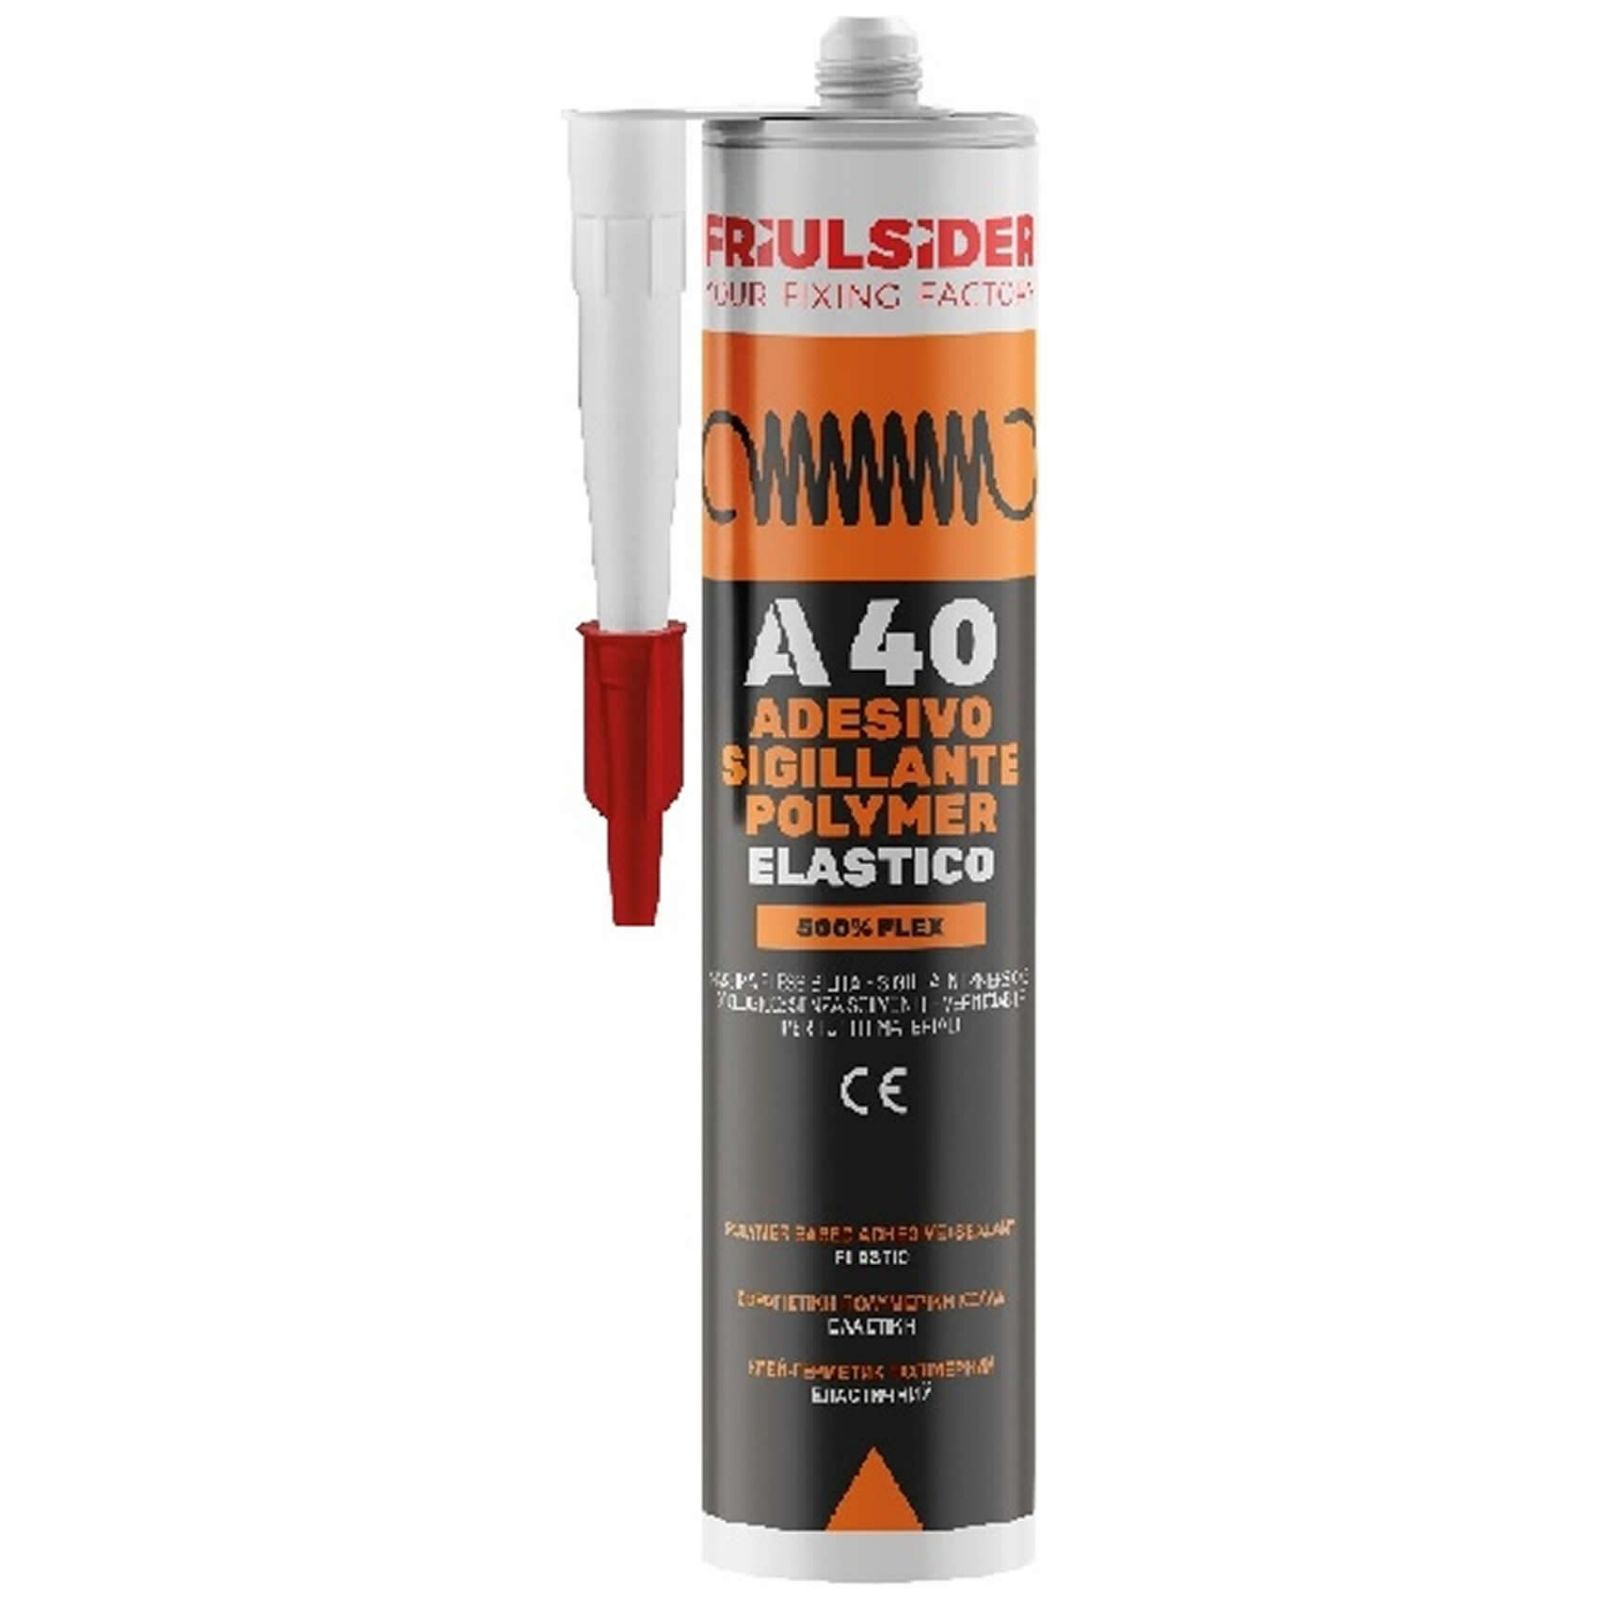 Friulsider adesivo sigillante elastico A40 grigio 280ml